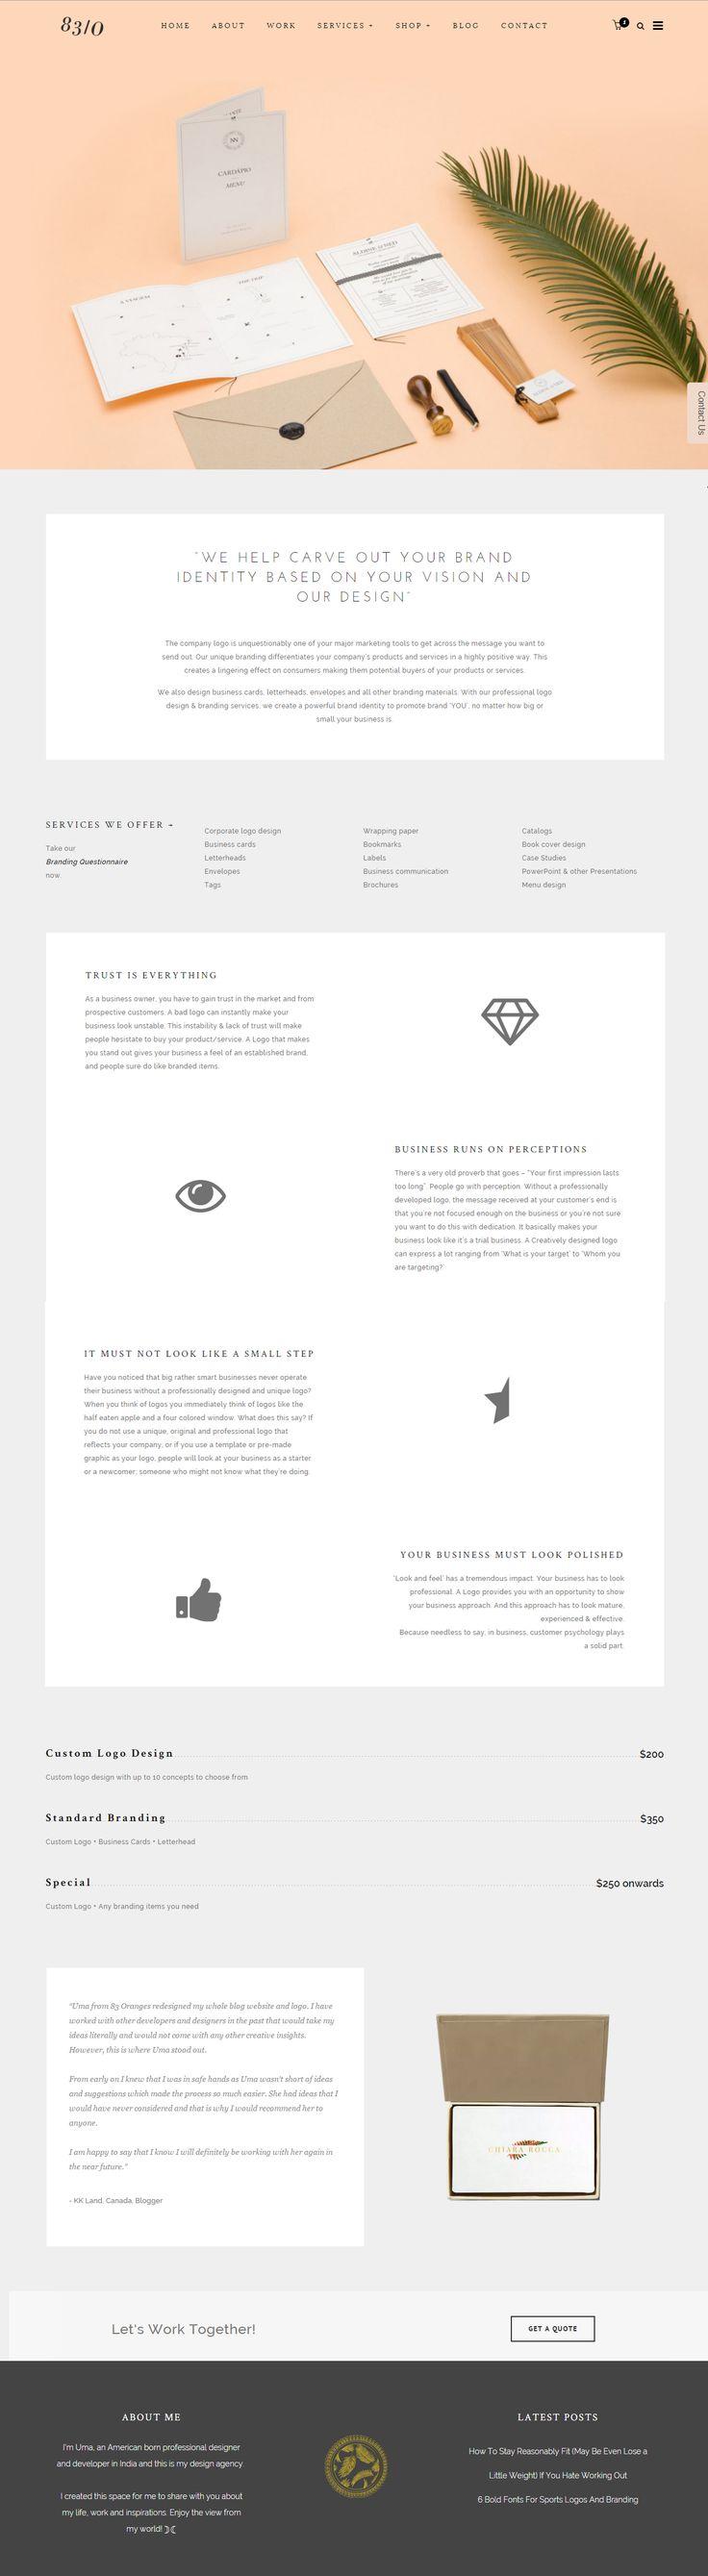 Brand Design Agency Webpage Layout #branding #logodesign #logodesigner #brandidentity #83oranges